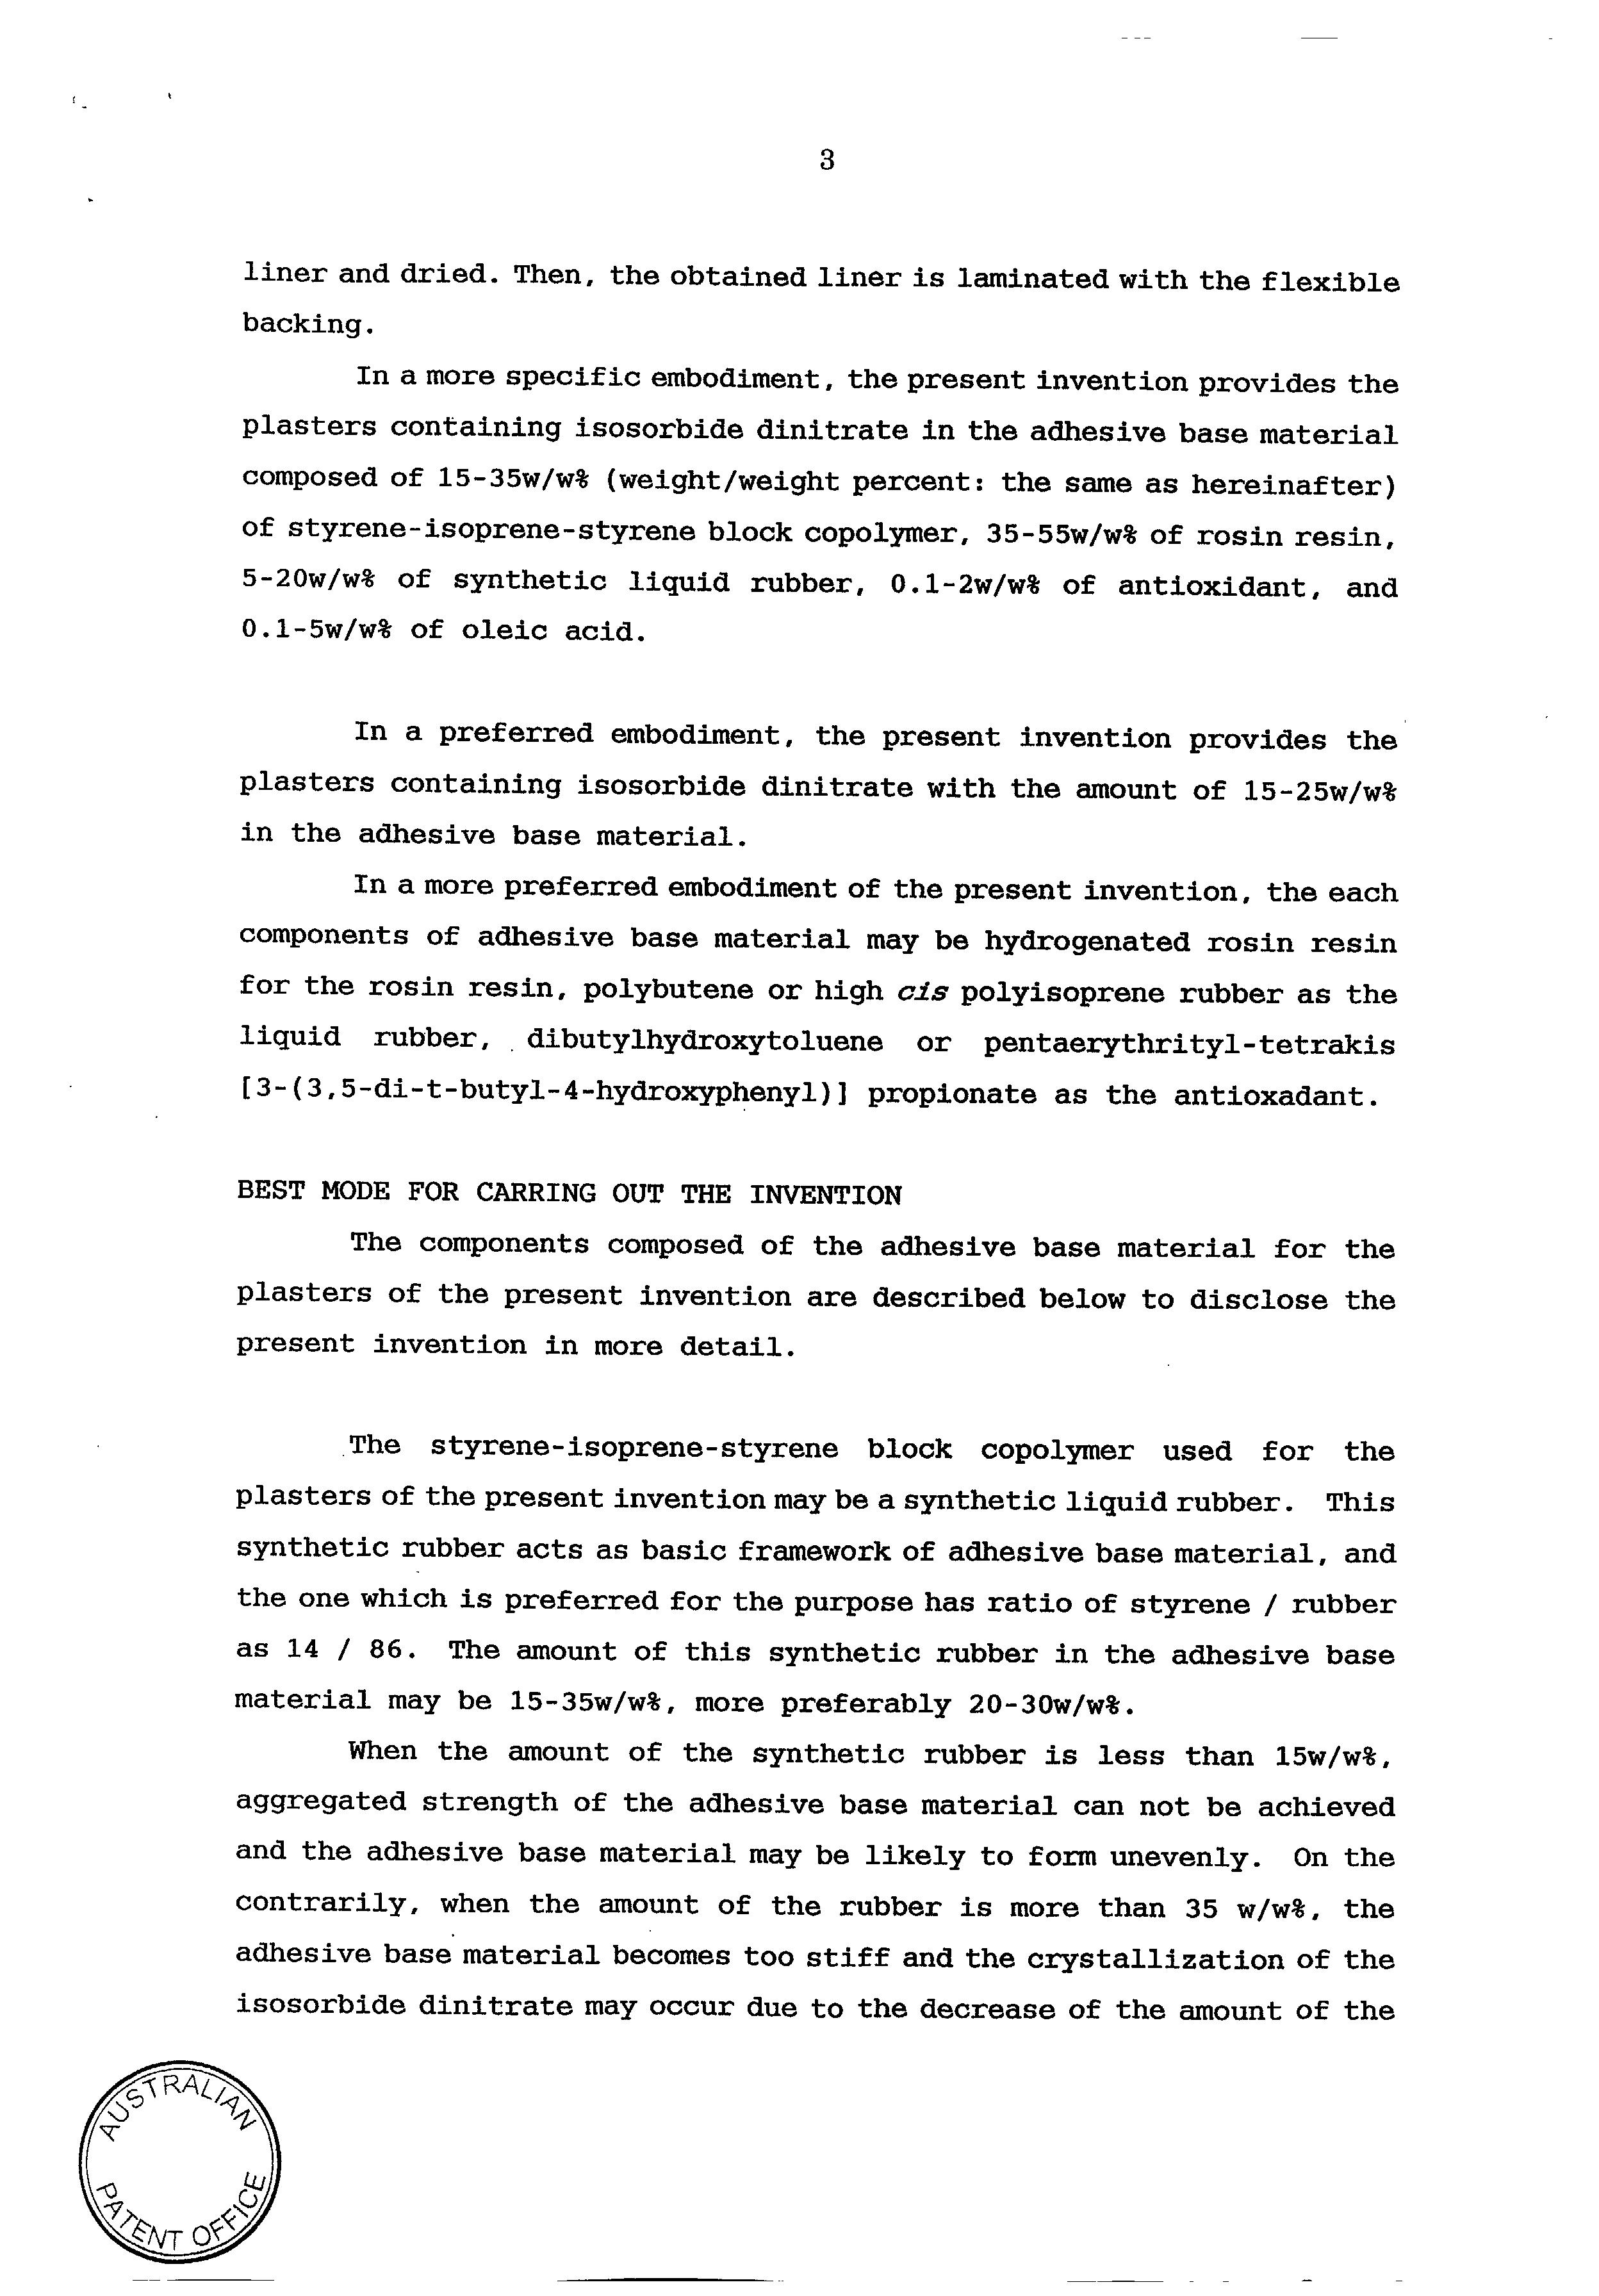 AU 726537 B2 - Plasters Containing Isosorbide Dinitrate